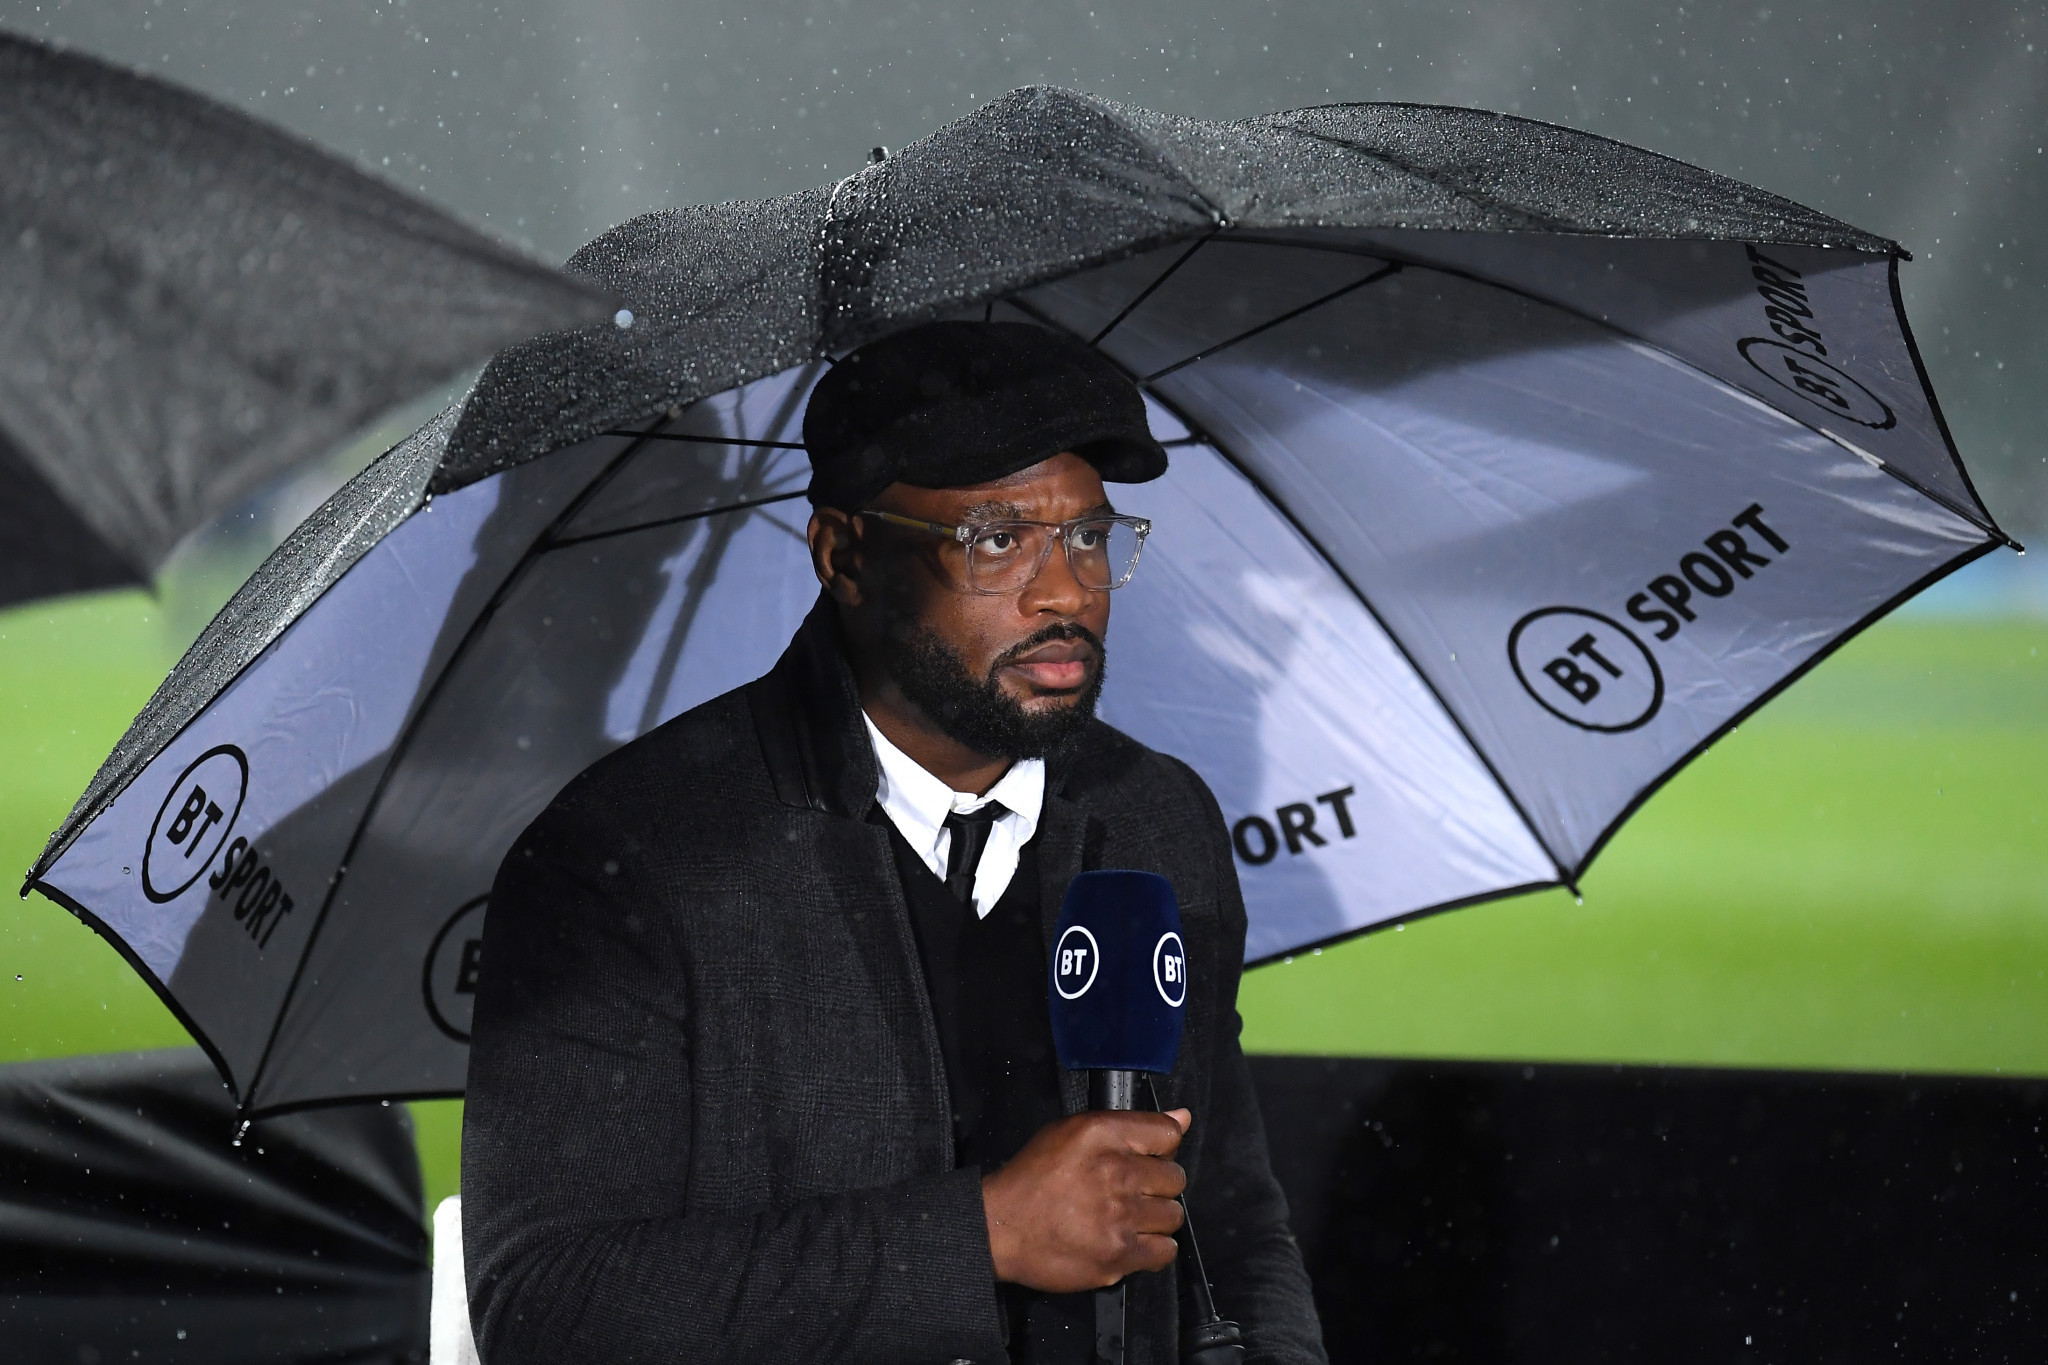 Former England wing Ugo Monye believes the UAR's U-turn shows